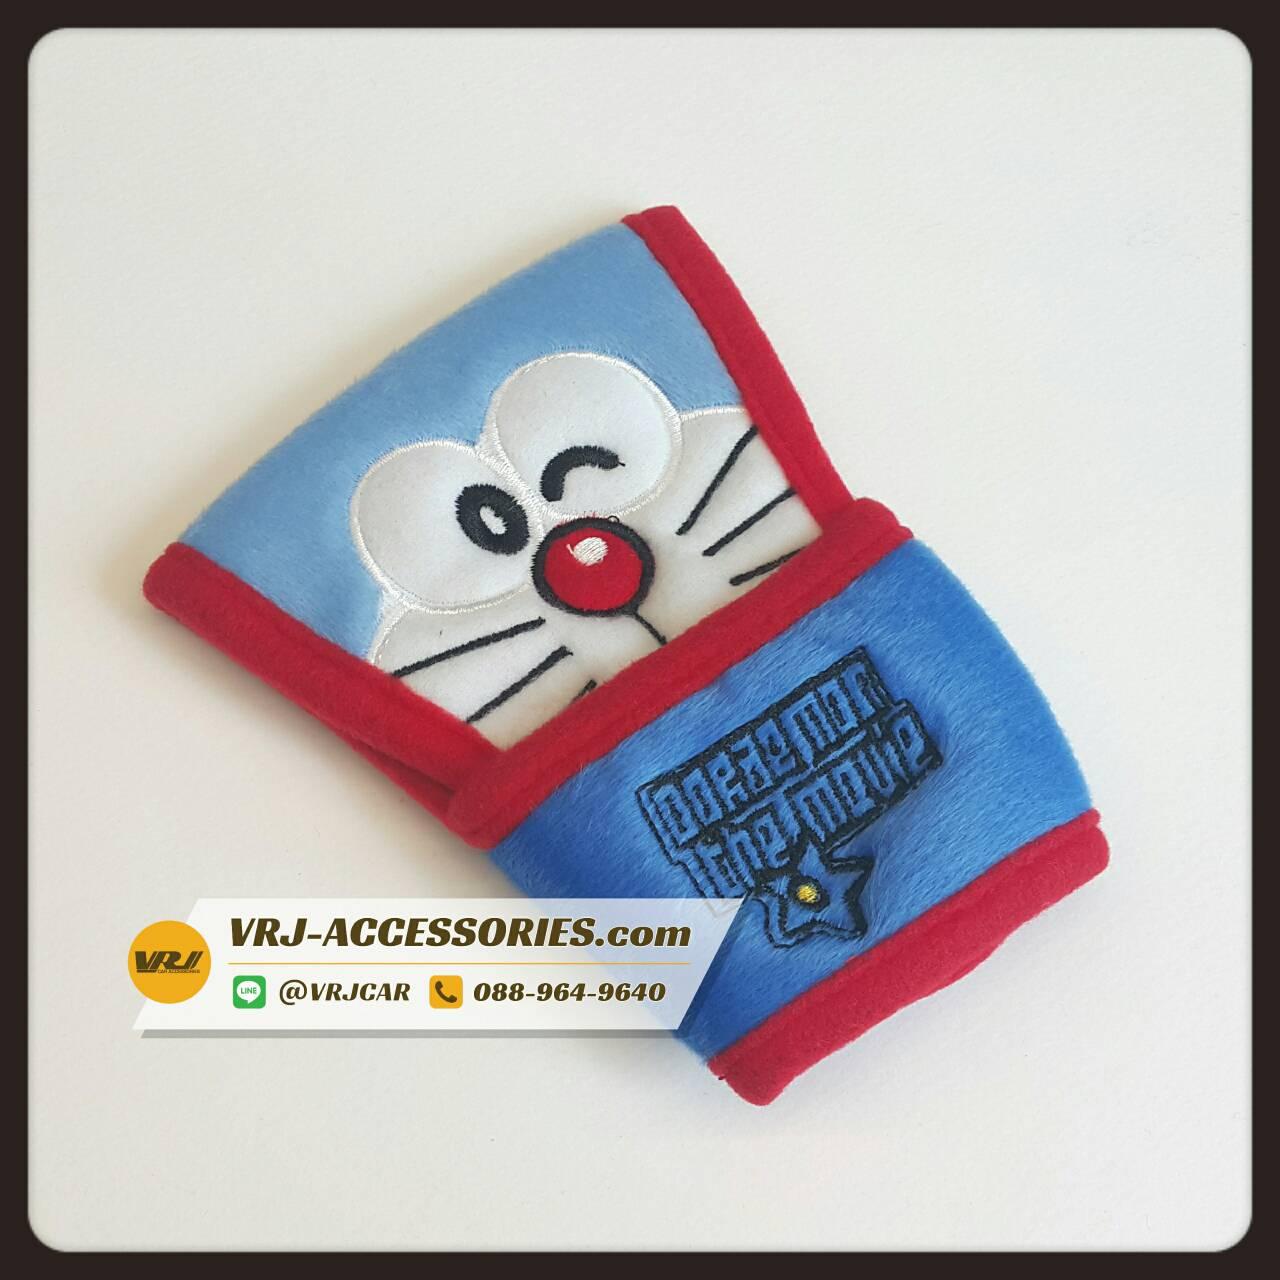 Doraemon หุ้มเกียร์ ออโต้ โดเรมอน กระดิ่ง สีฟ้า Knob cover and Hand brake cover